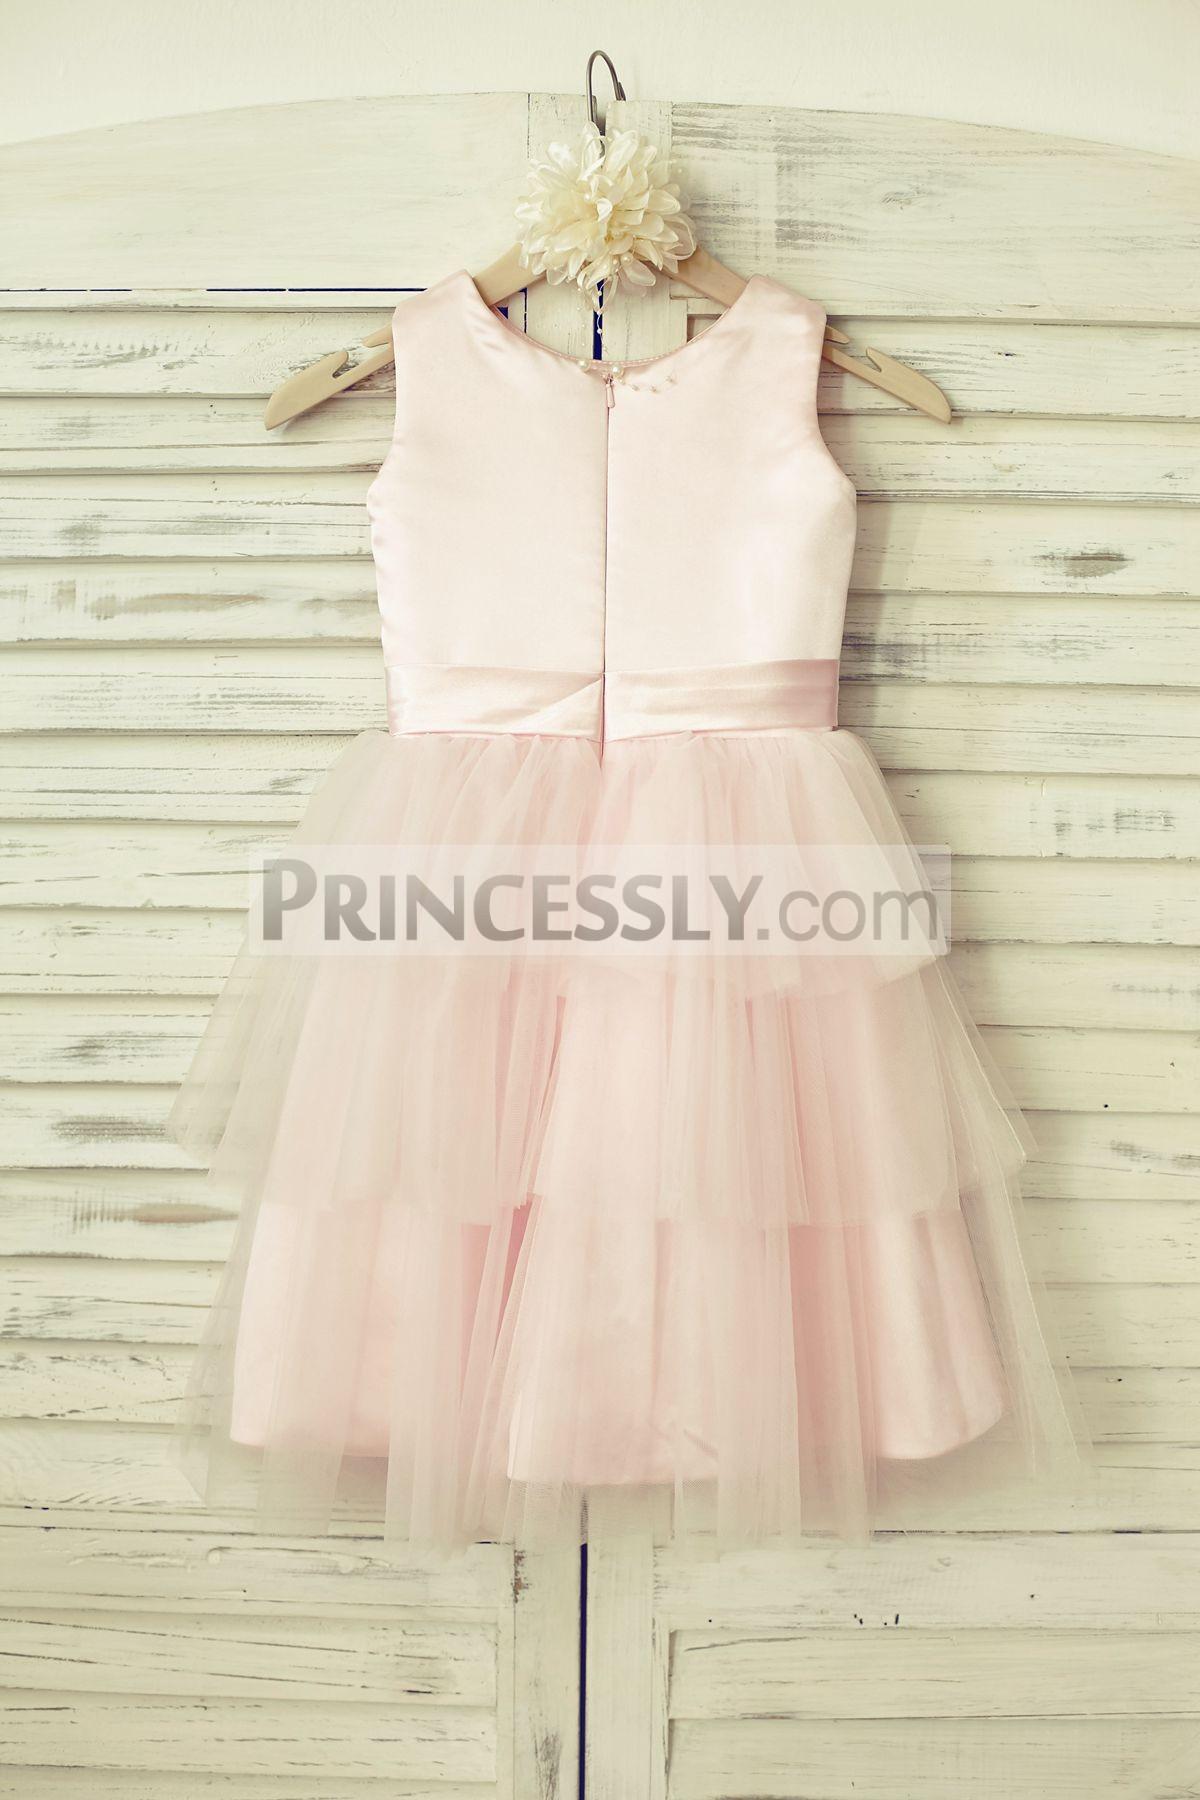 Satin tulle pink wedding little baby girl dress